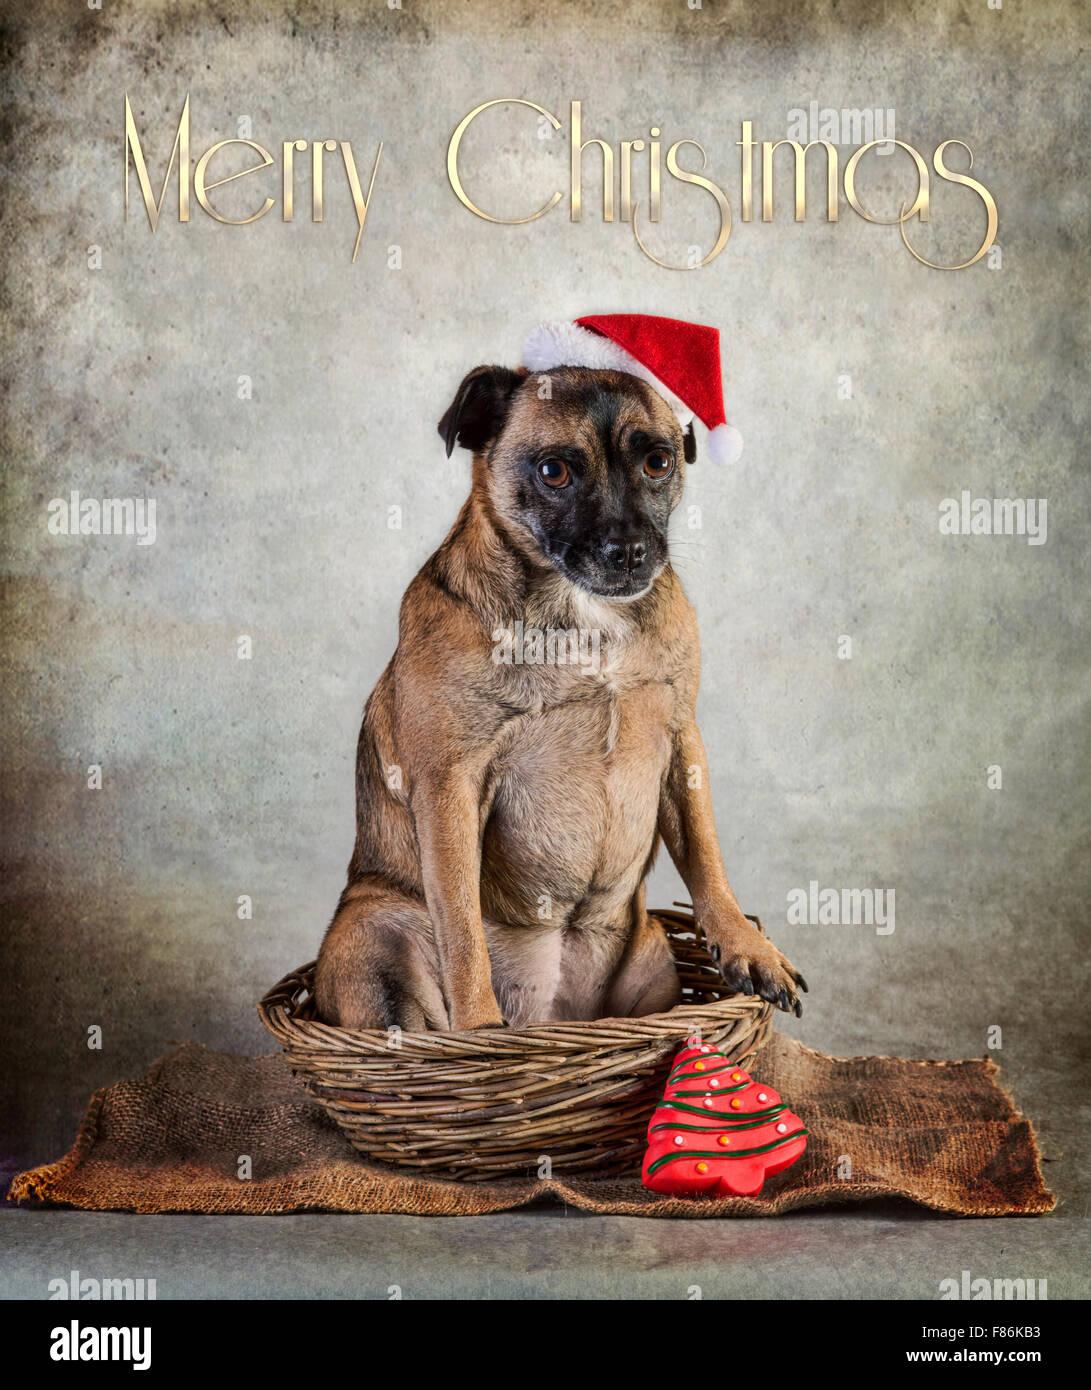 Cute Pug cross dog in Santa hat and scarf Stock Photo  91116007 - Alamy 70aa577675c